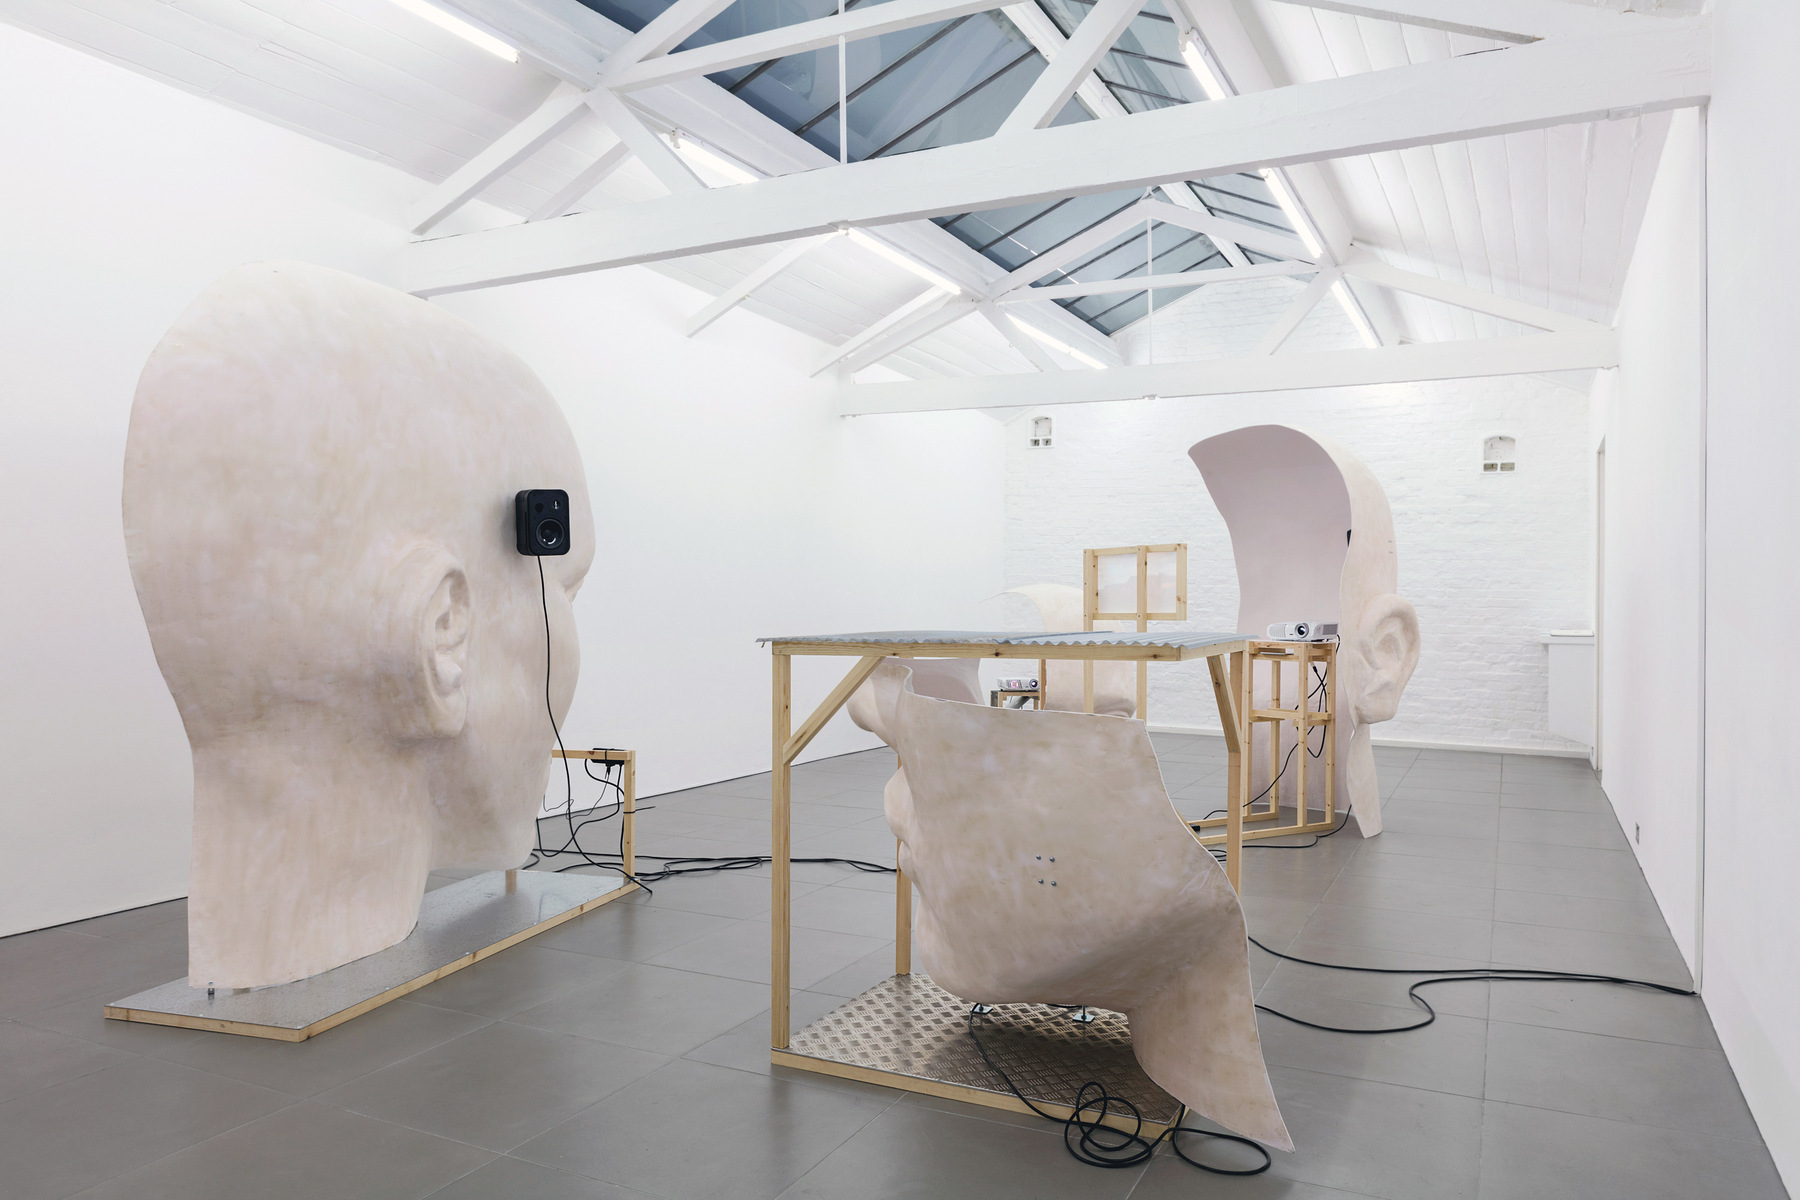 05. Anne de Vries, SUBMISSION 2015, wood, metal, fibreglass resin, audio, video